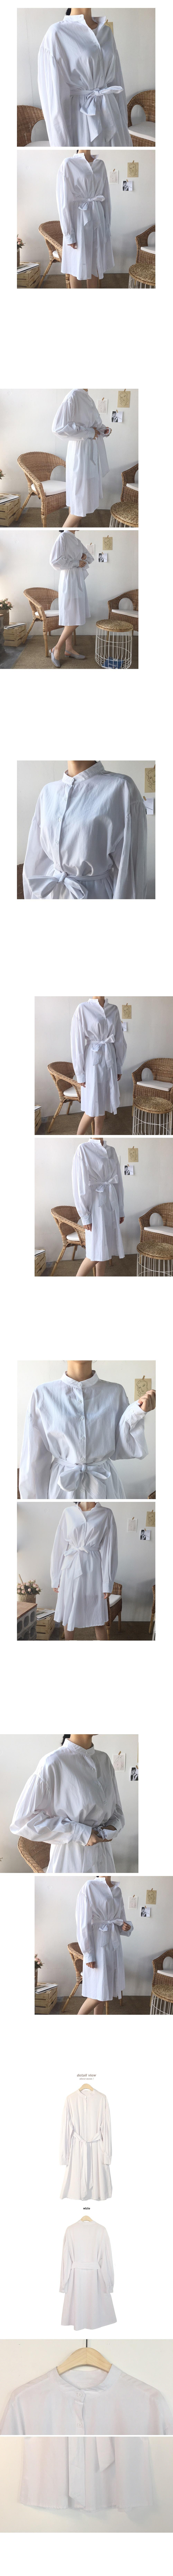 Maron dress